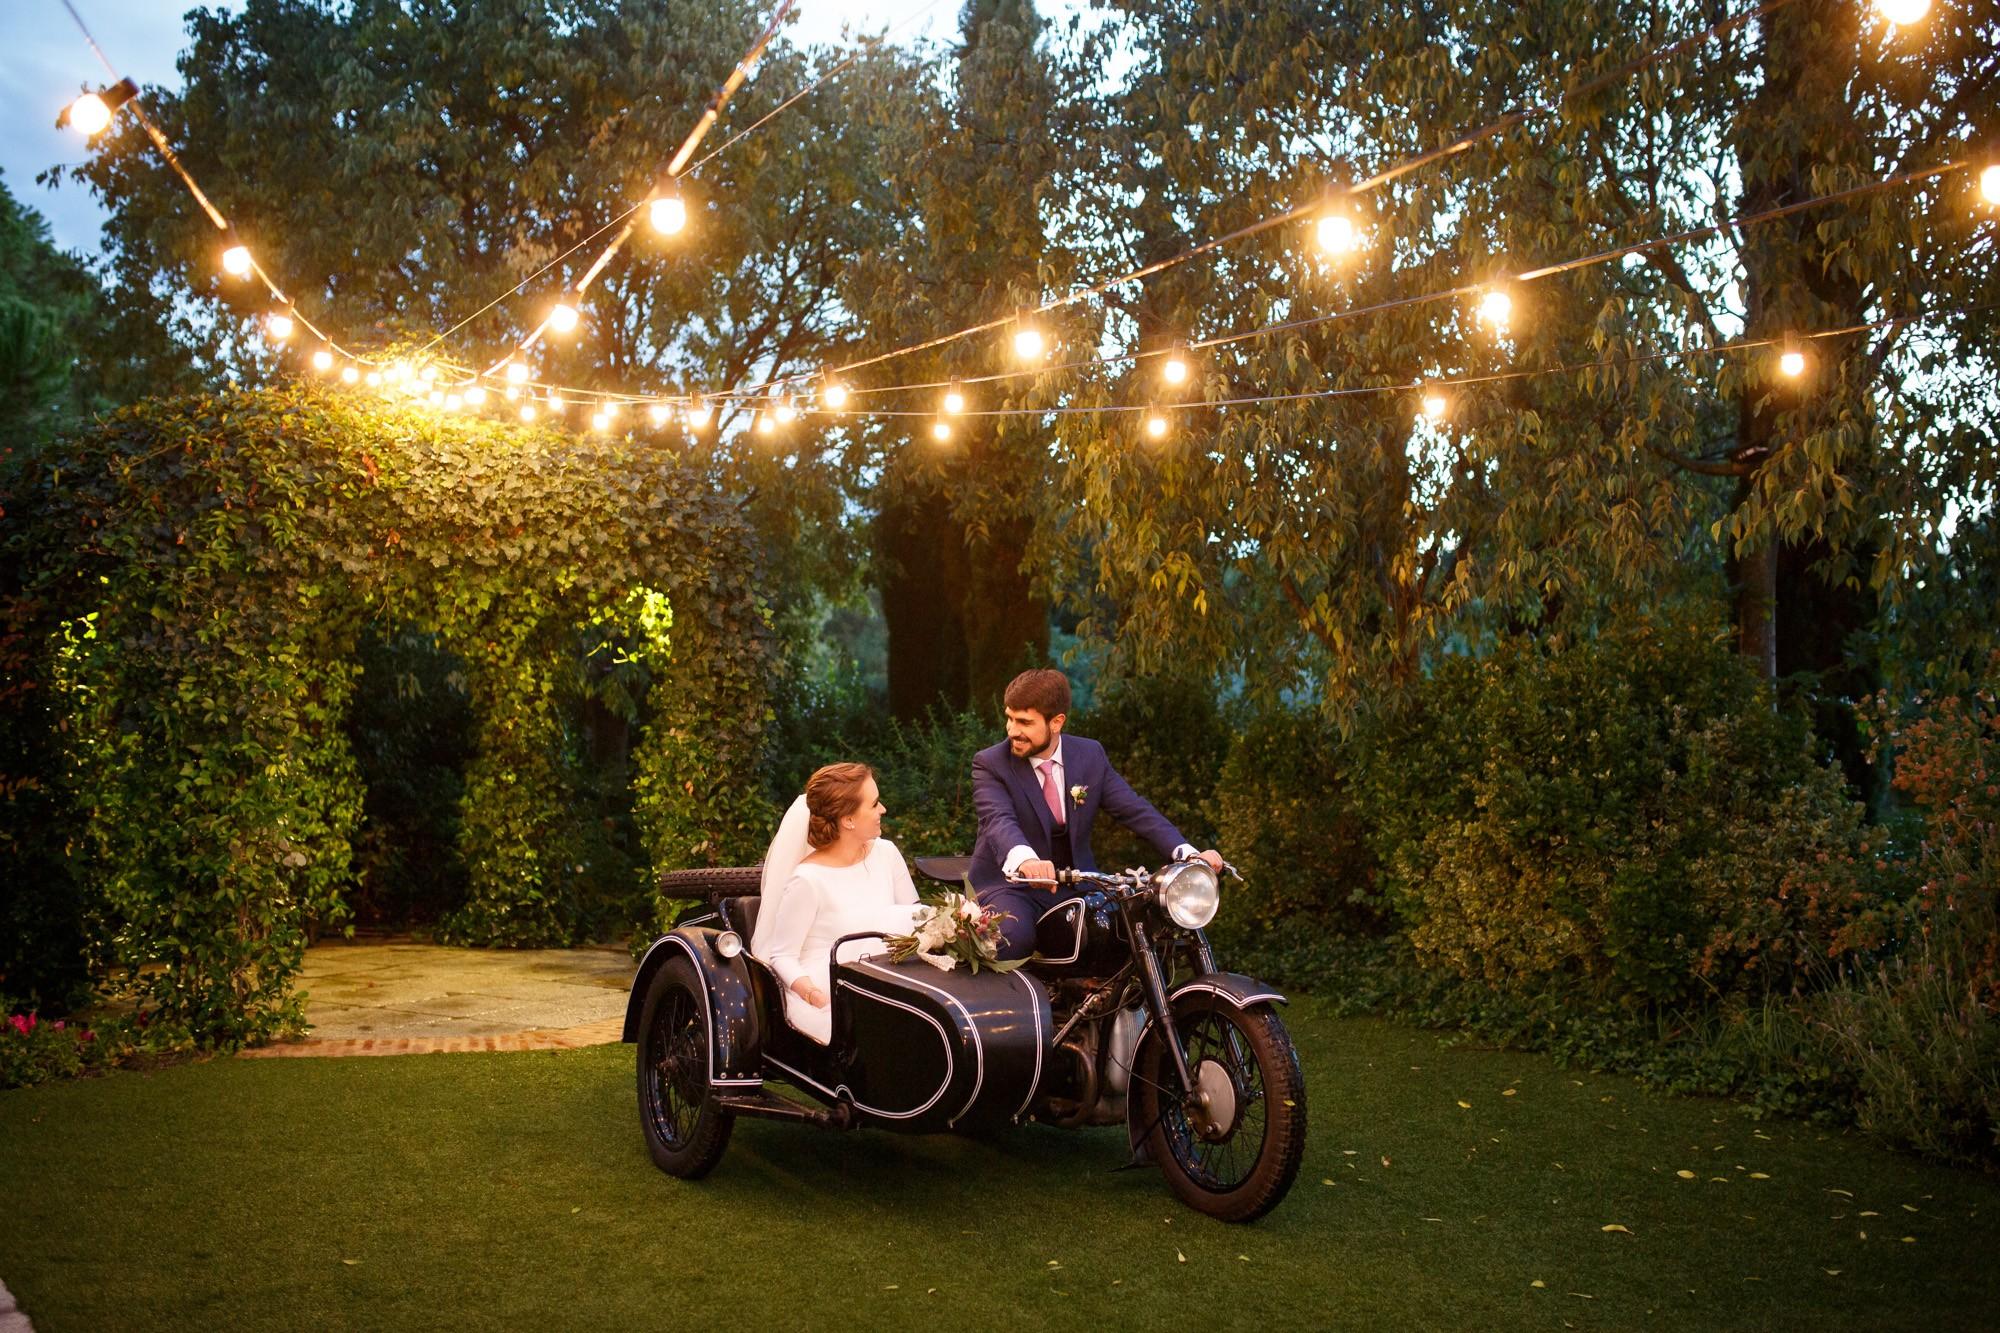 fotografos-boda-el-cigarral-de-las-mercedes-279243